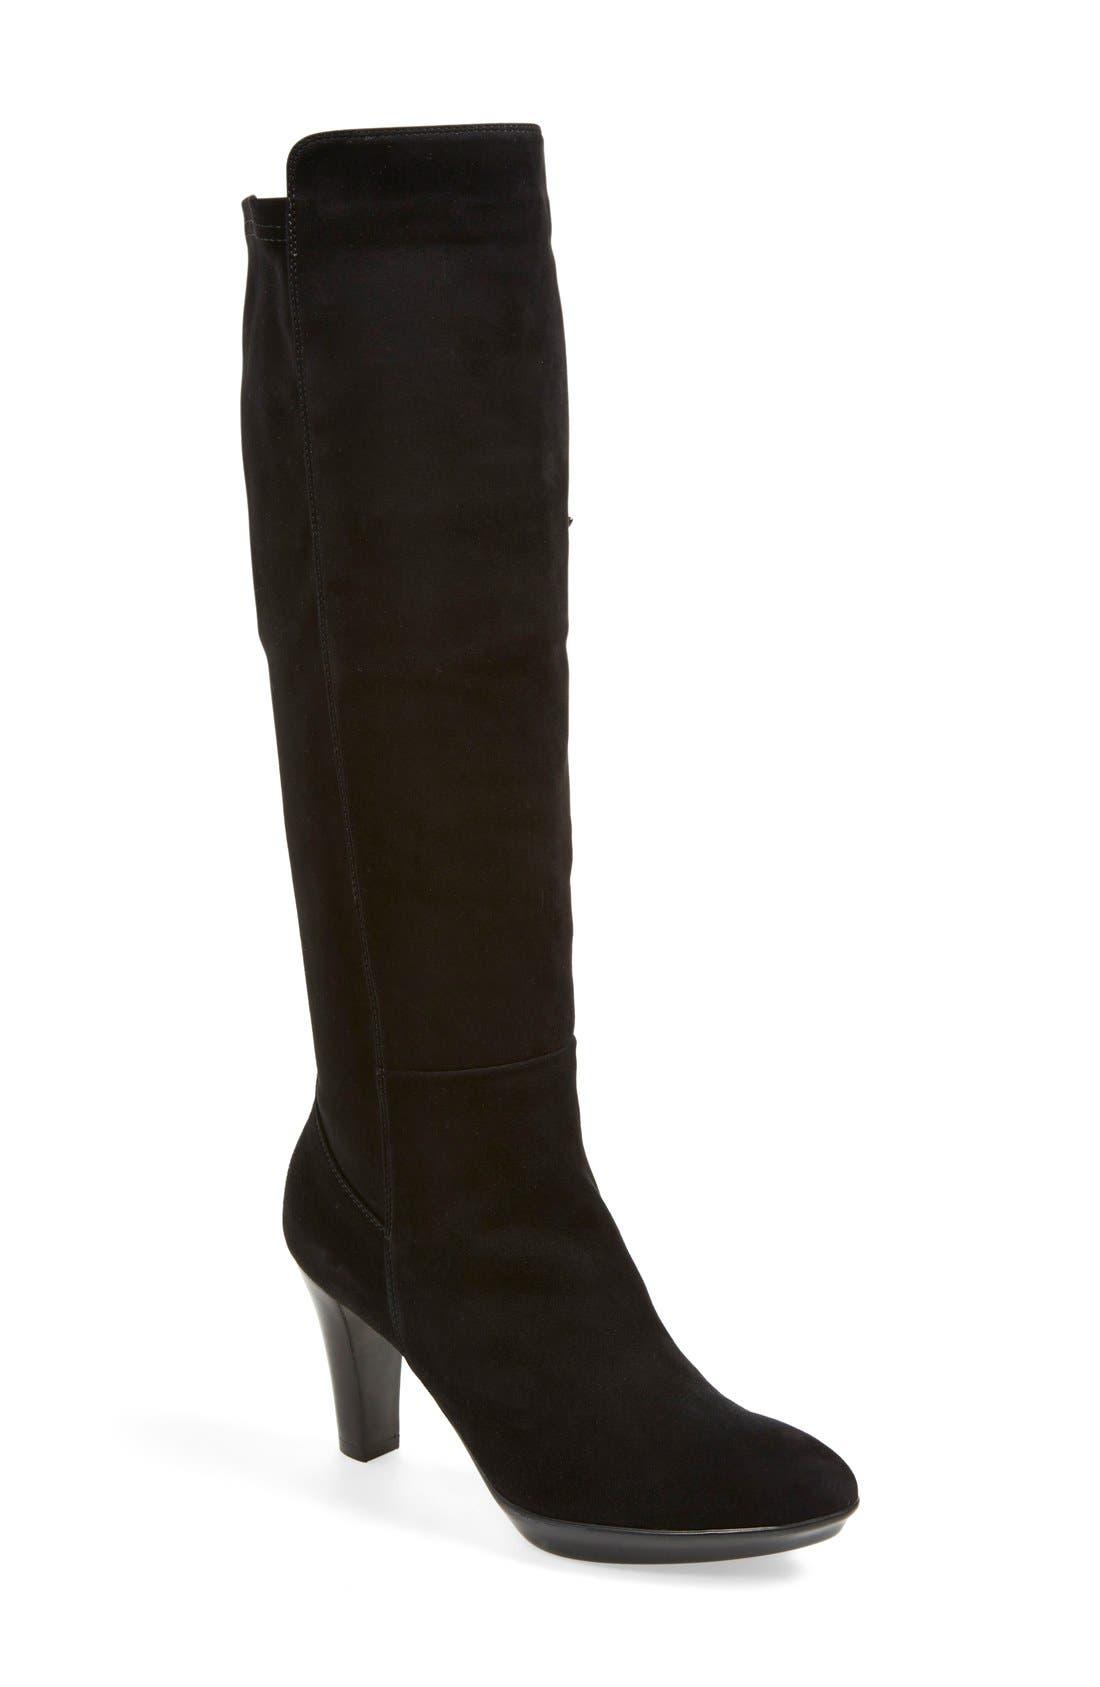 Main Image - Aquatalia 'Raine' Weatherproof Tall Boot (Women)